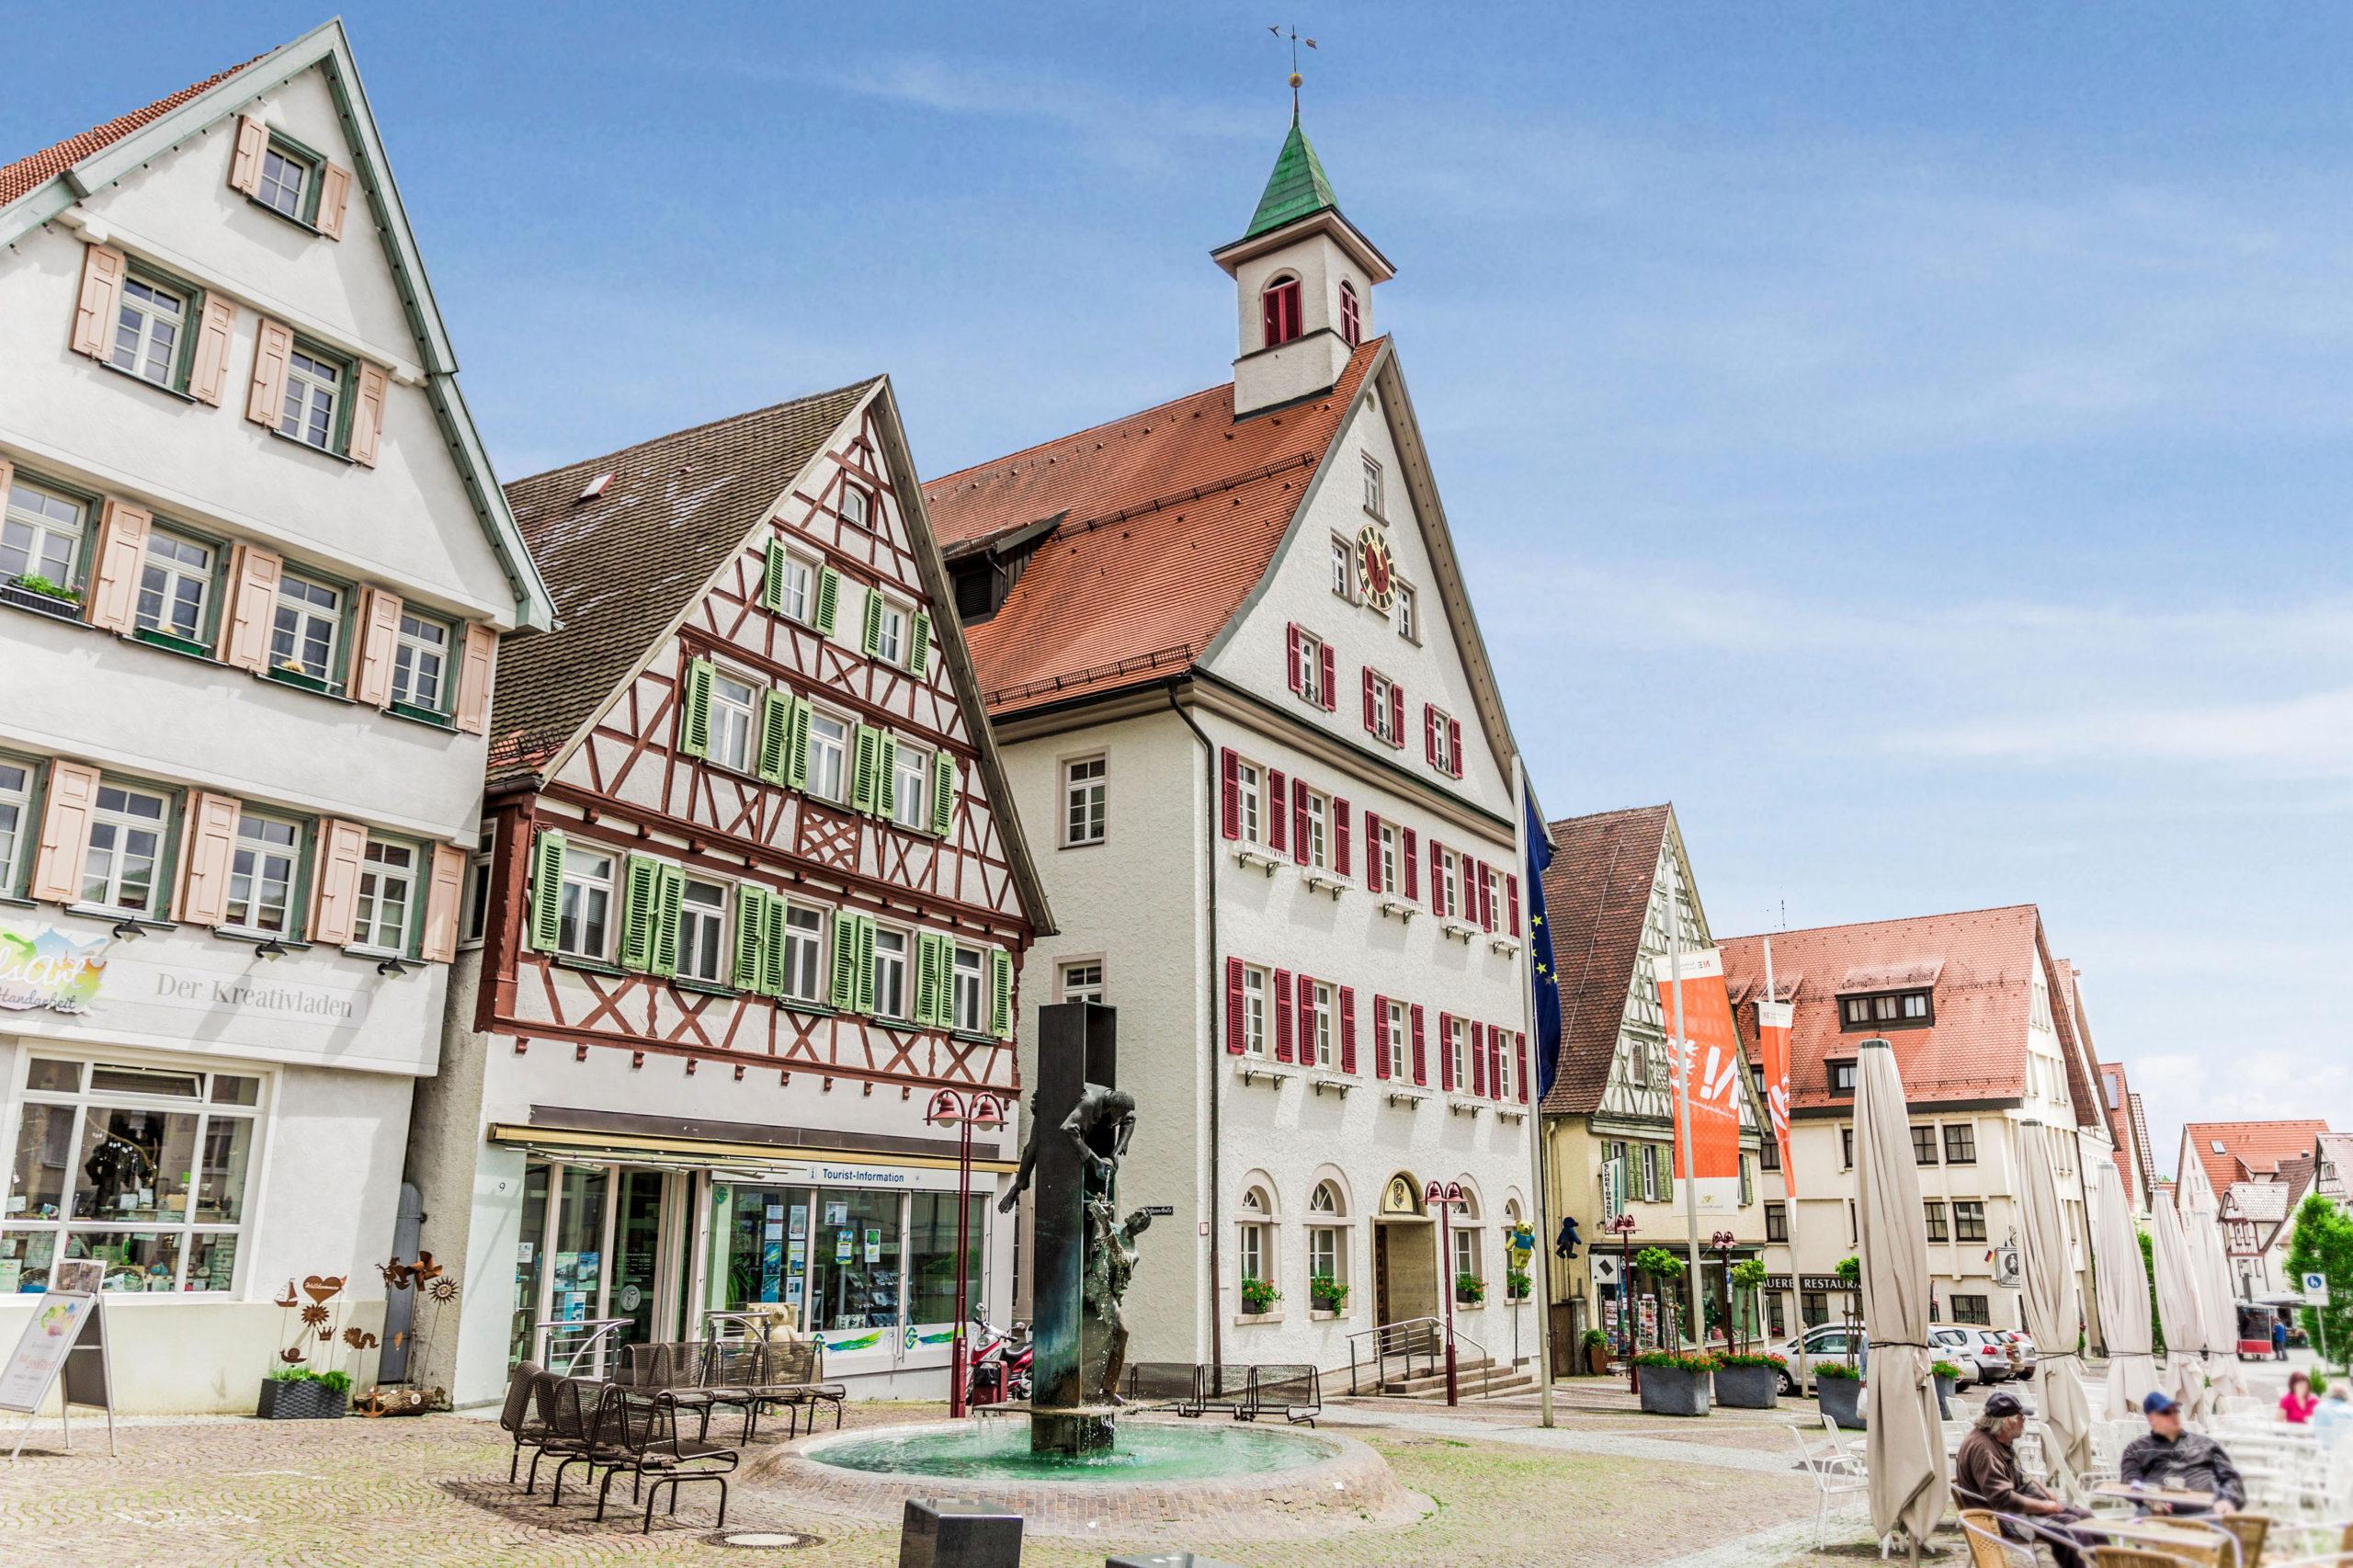 Altstadt in Giengen an der Brenz